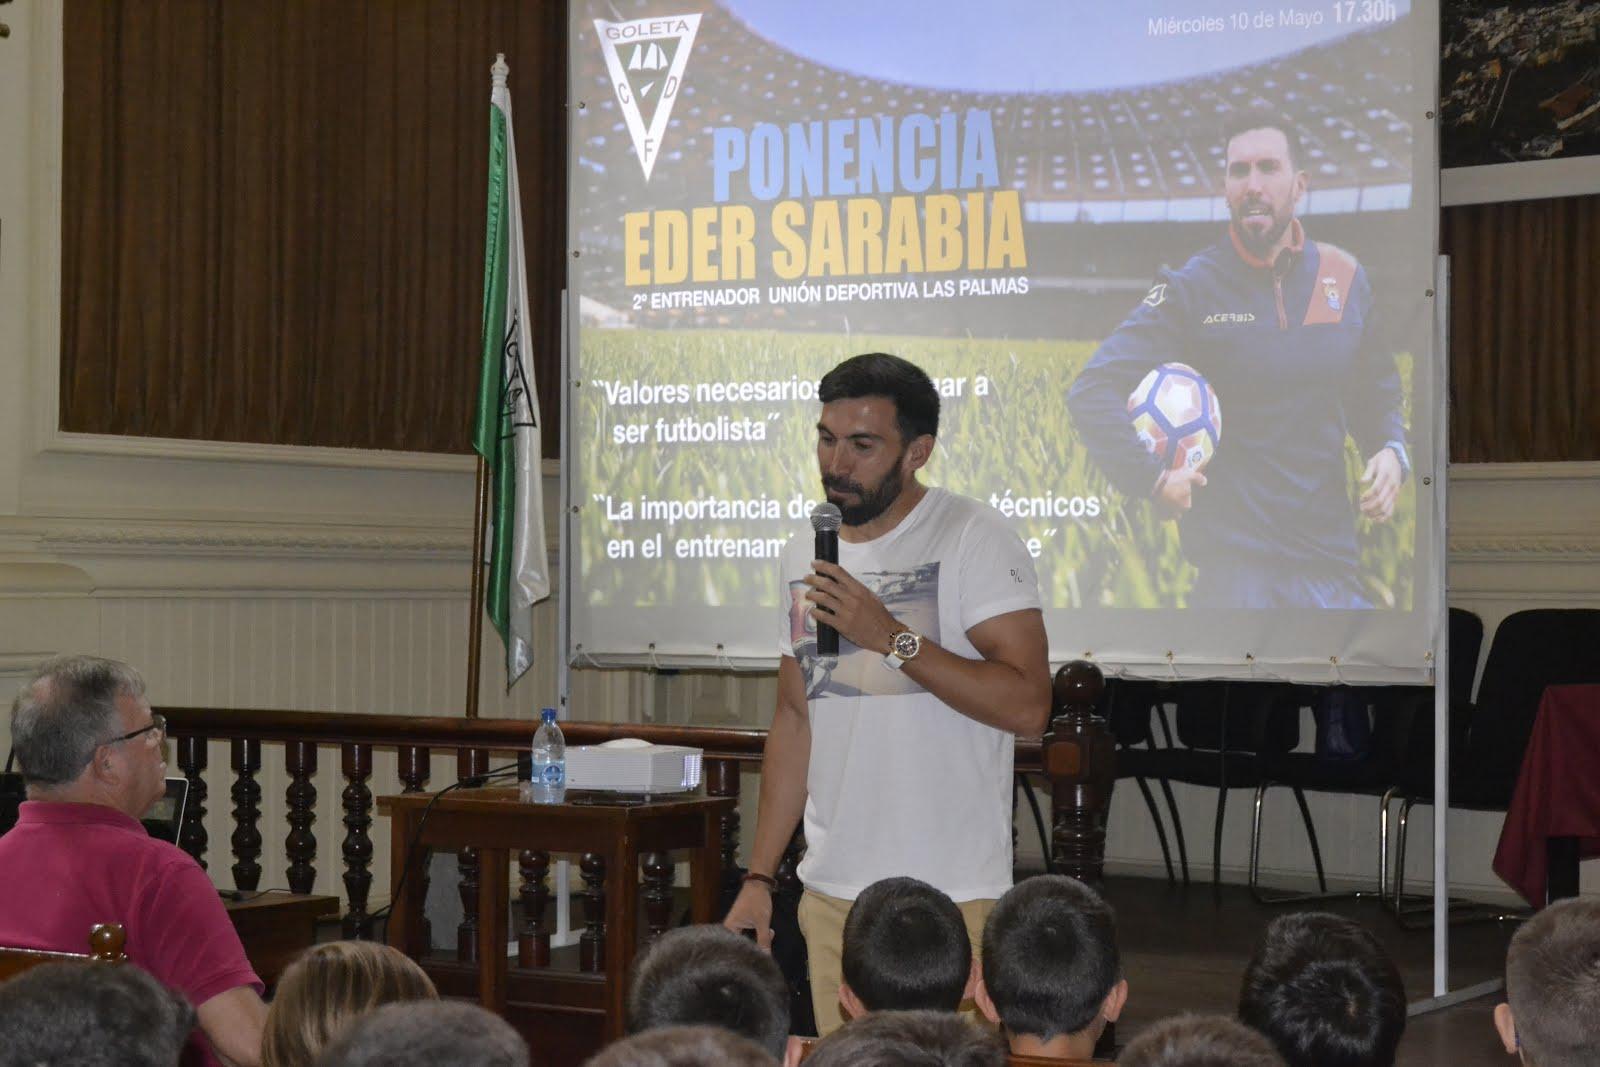 Visita de Eder Sarabia